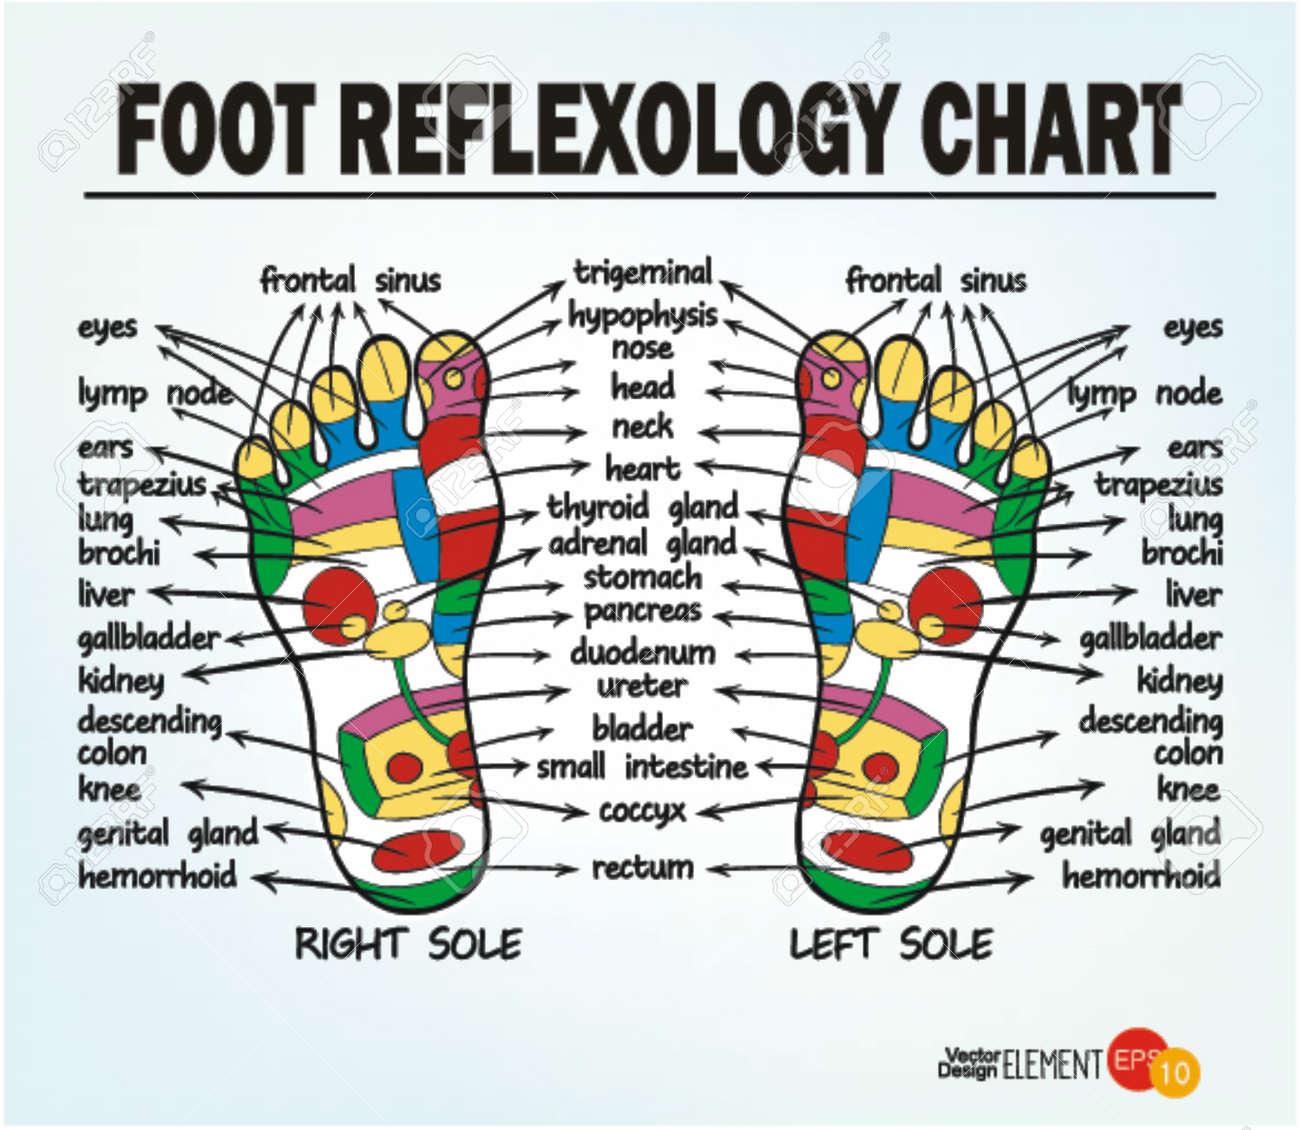 Foot reflexology chart vector illustration royalty free cliparts